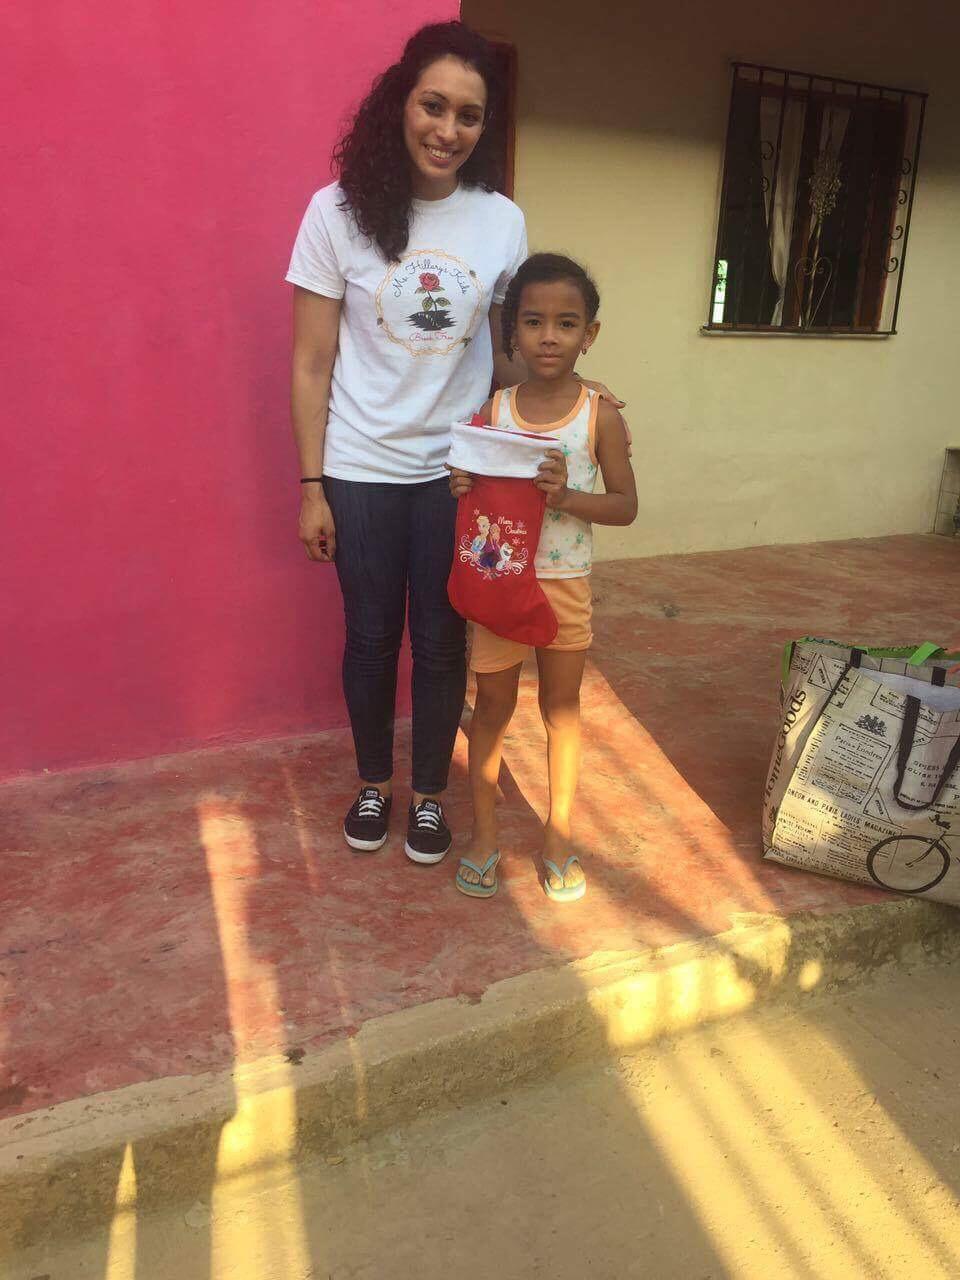 Mentee Arleen giving back in Colombia 4